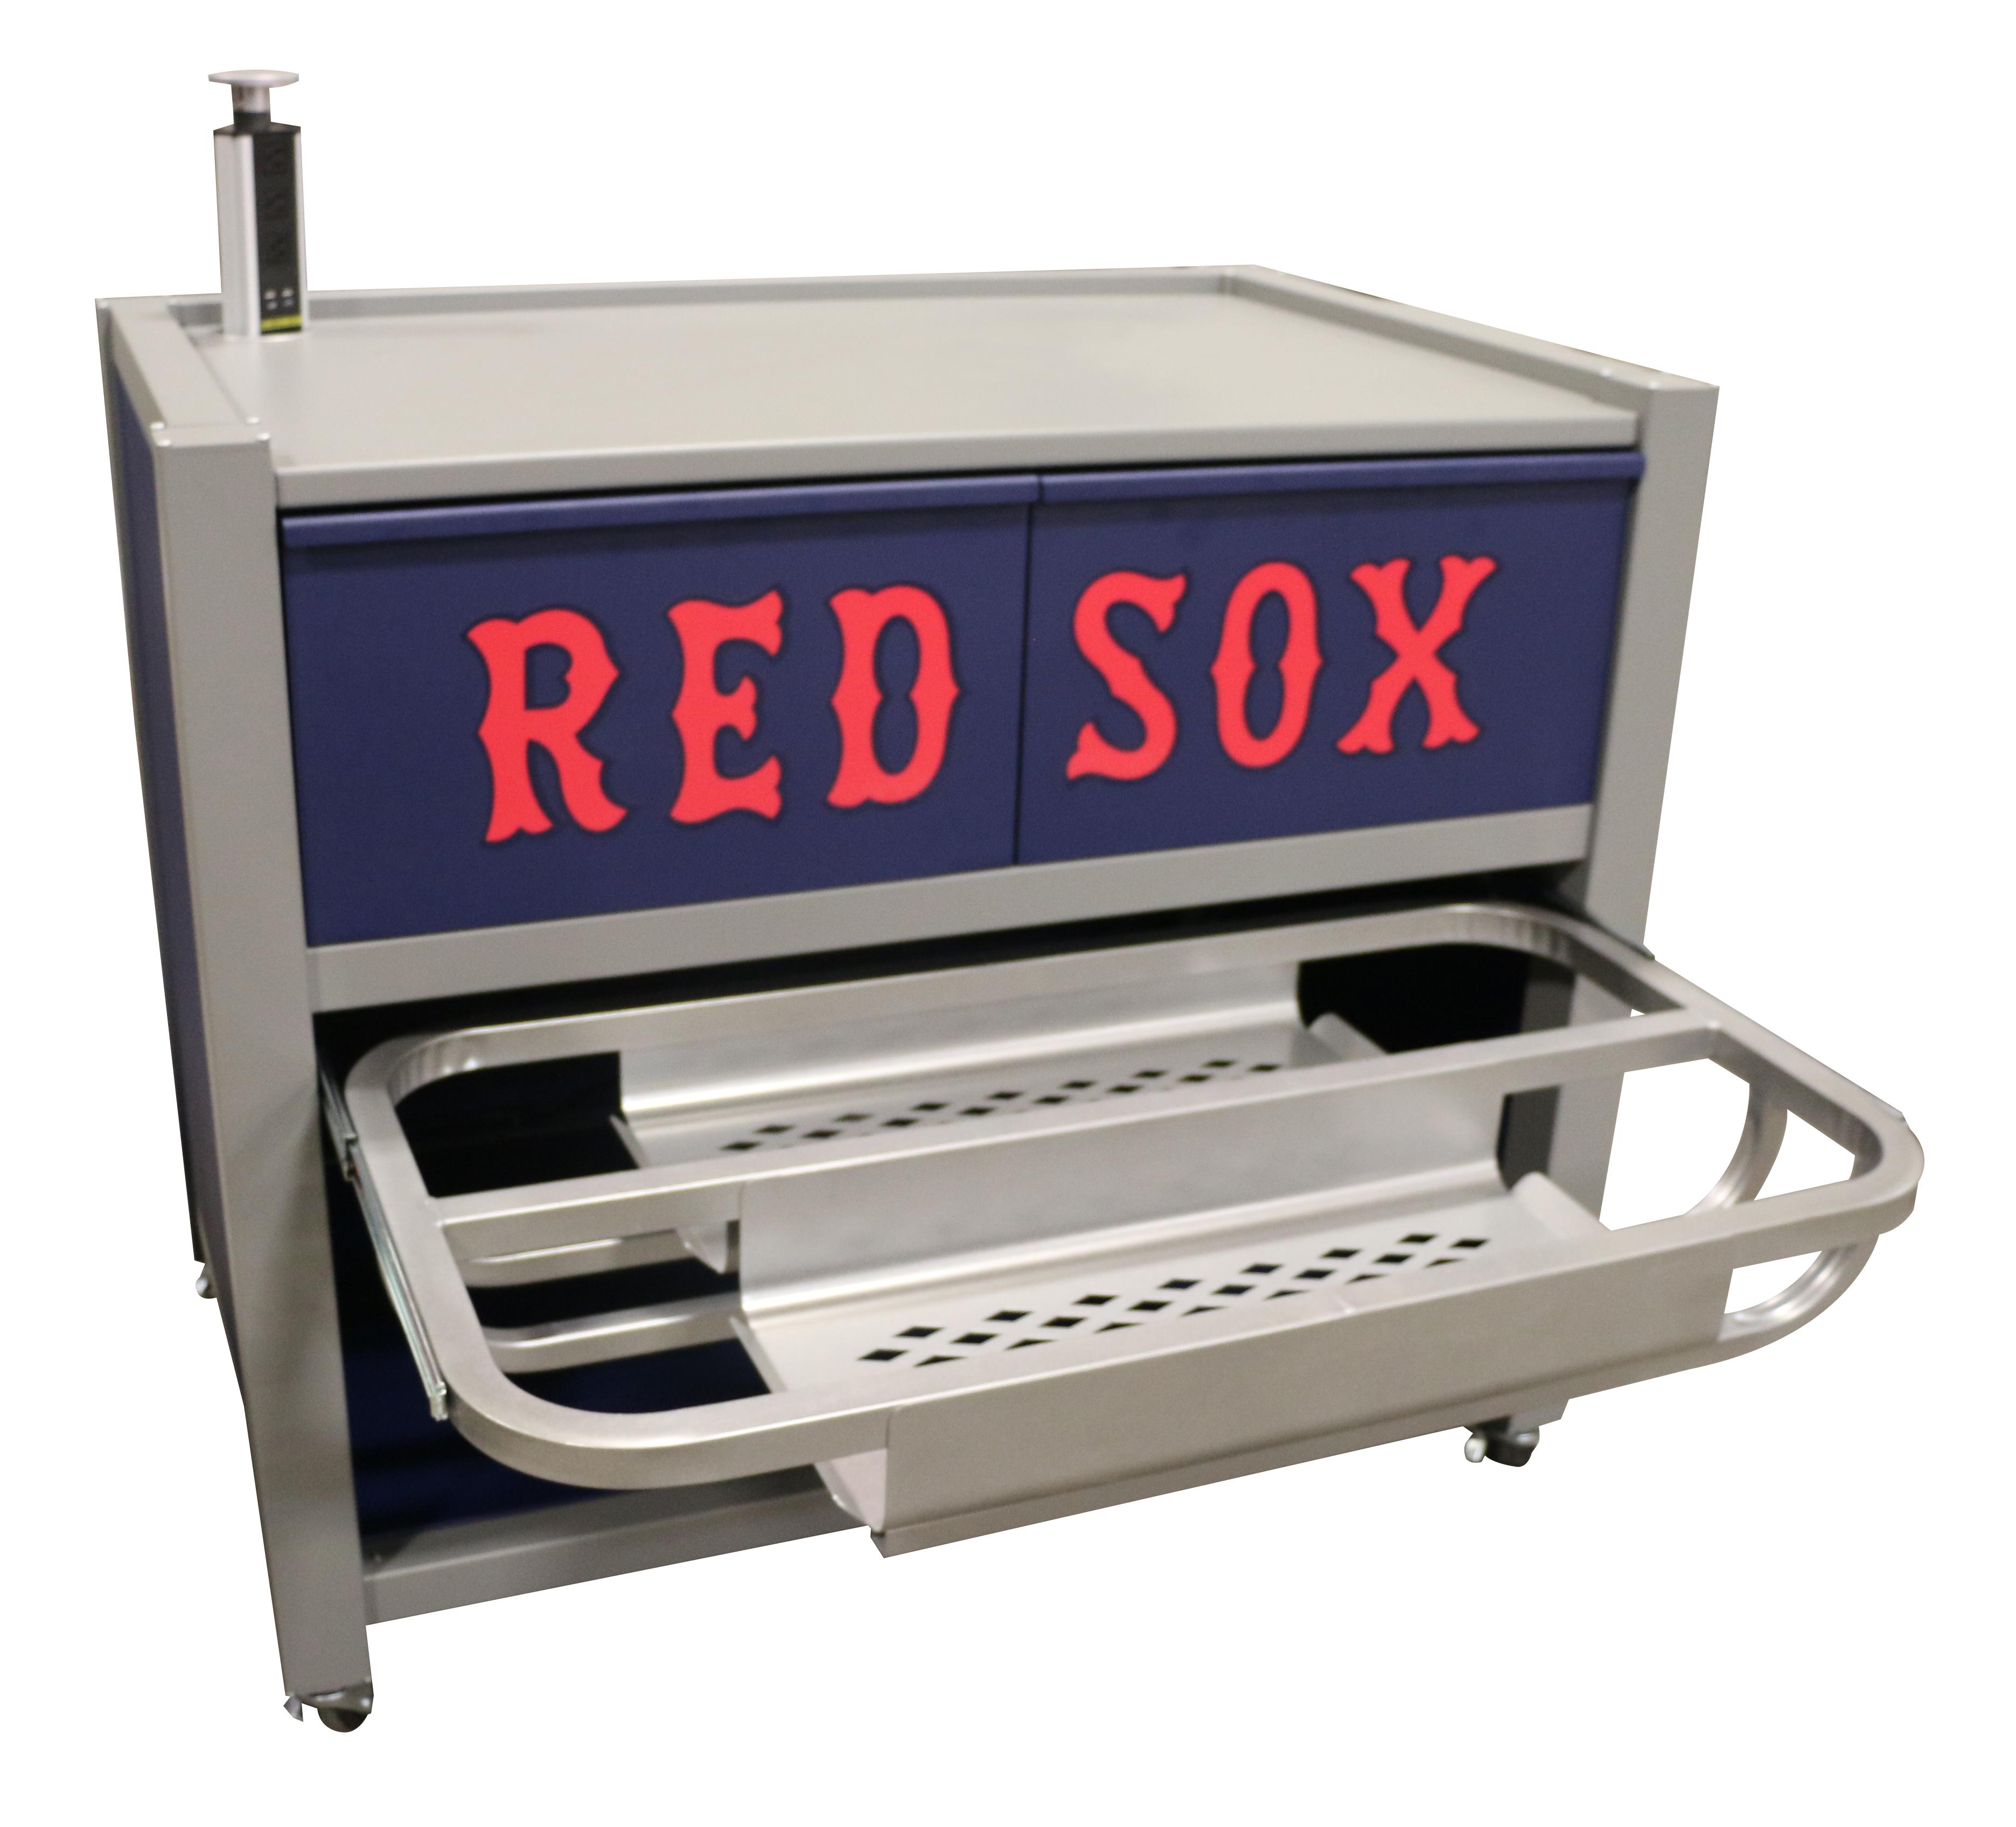 Boston Red Sox-(XL Modality Cart)